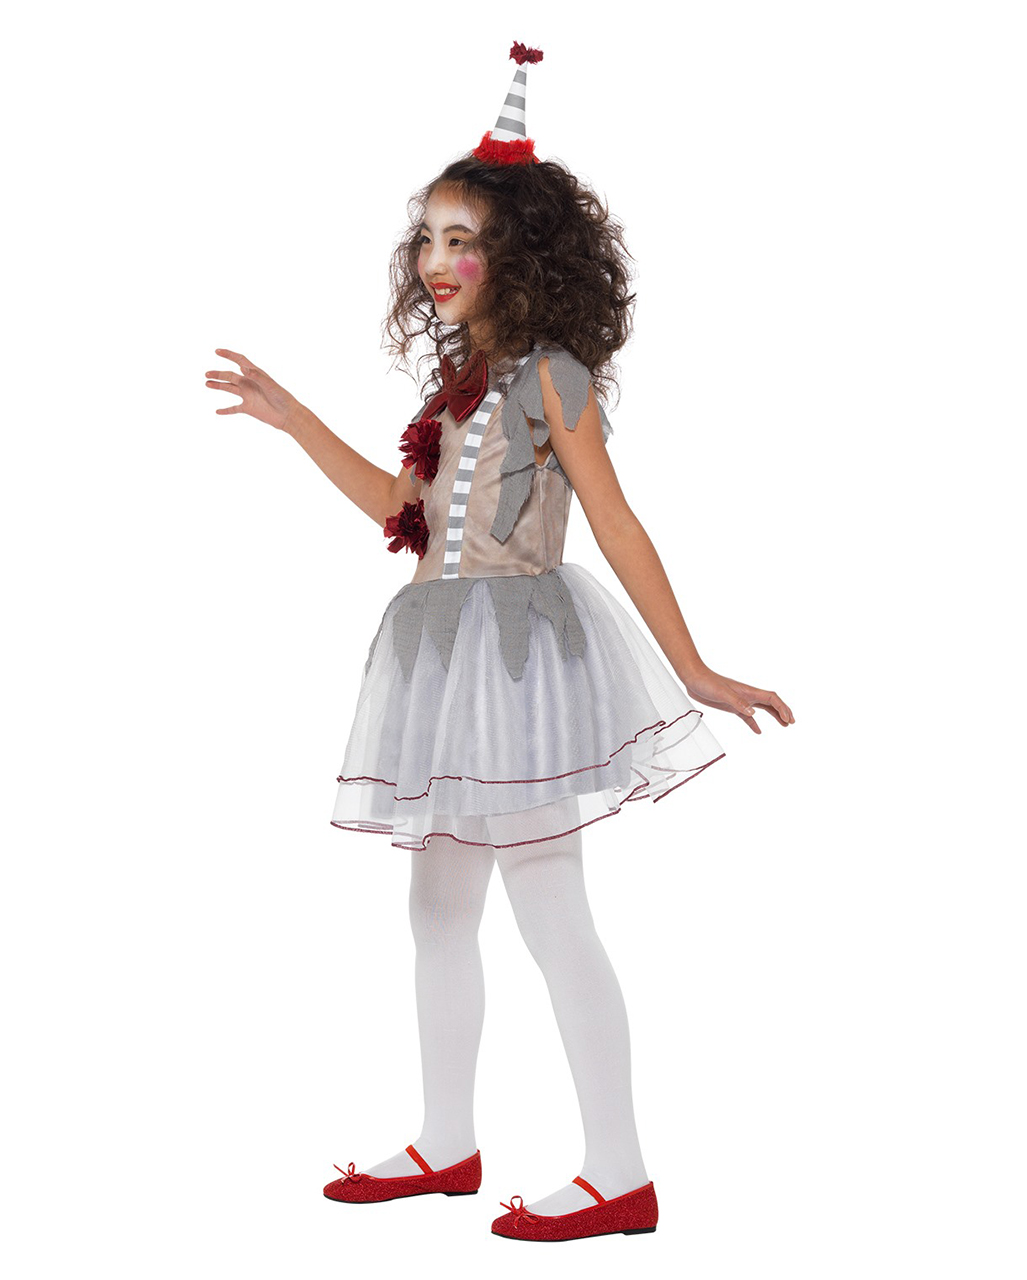 Halloween Clown Girl Outfit.Vintage Horror Clown Girl Costume